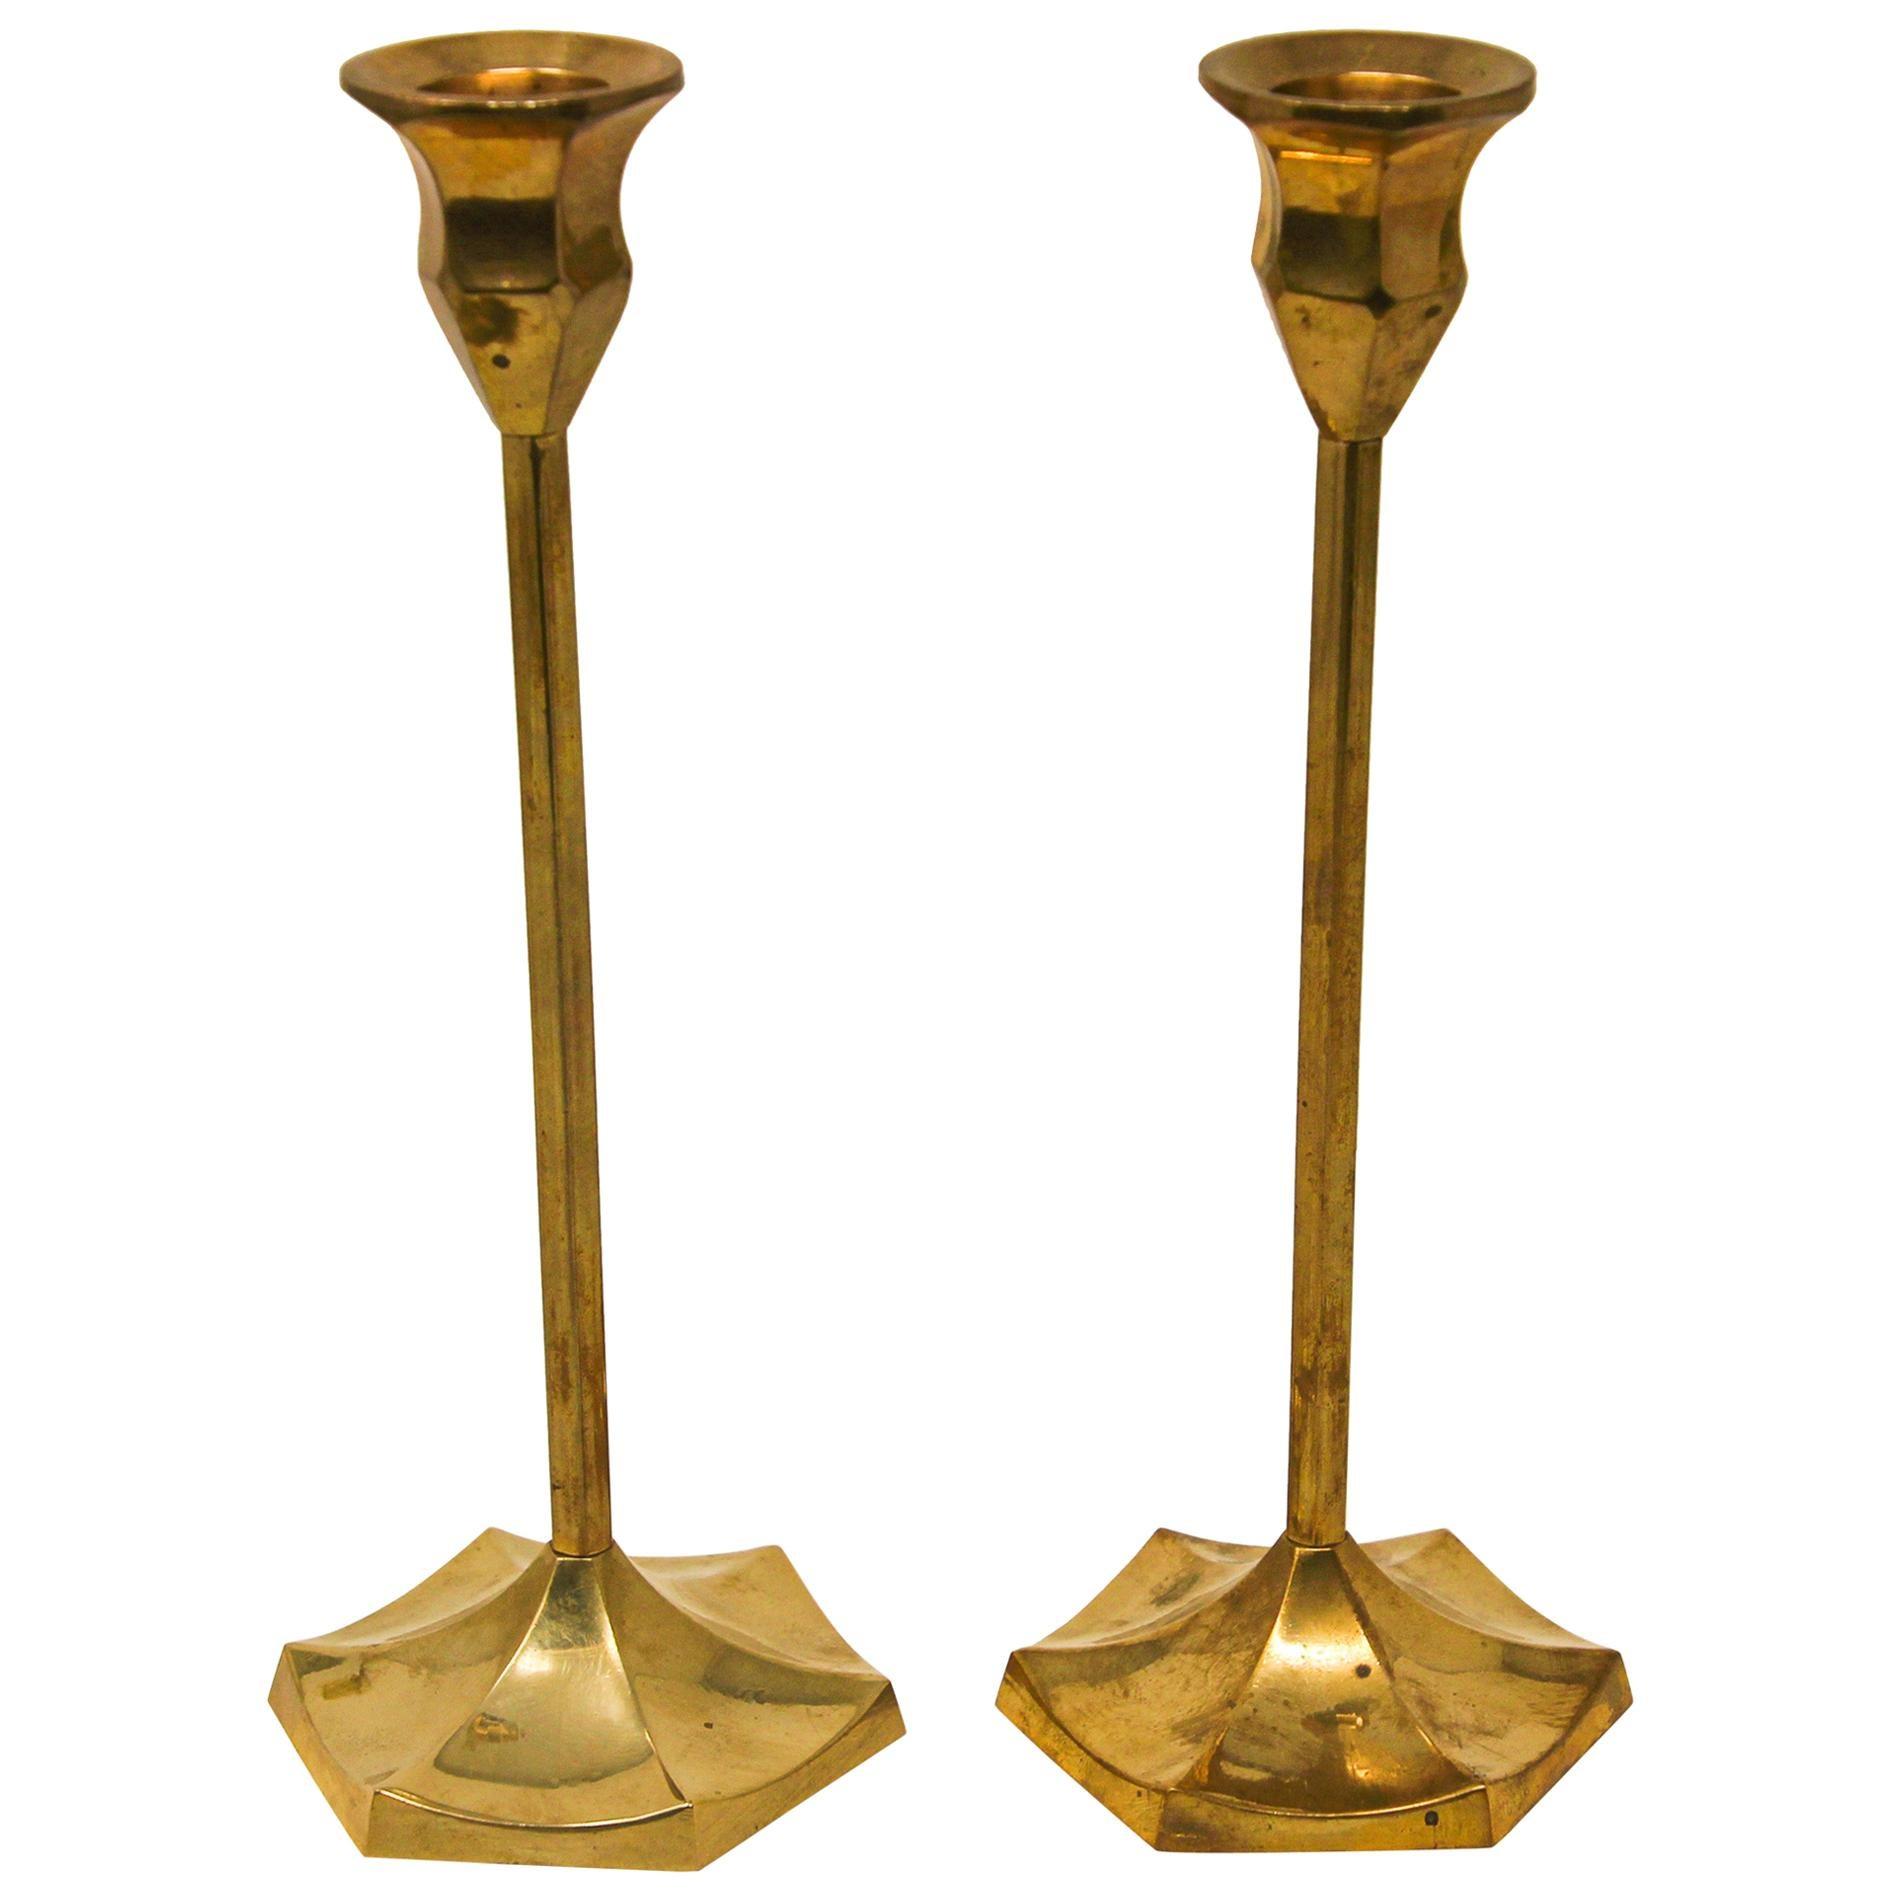 Pair of Polished Vintage Swedish Brass Candlesticks